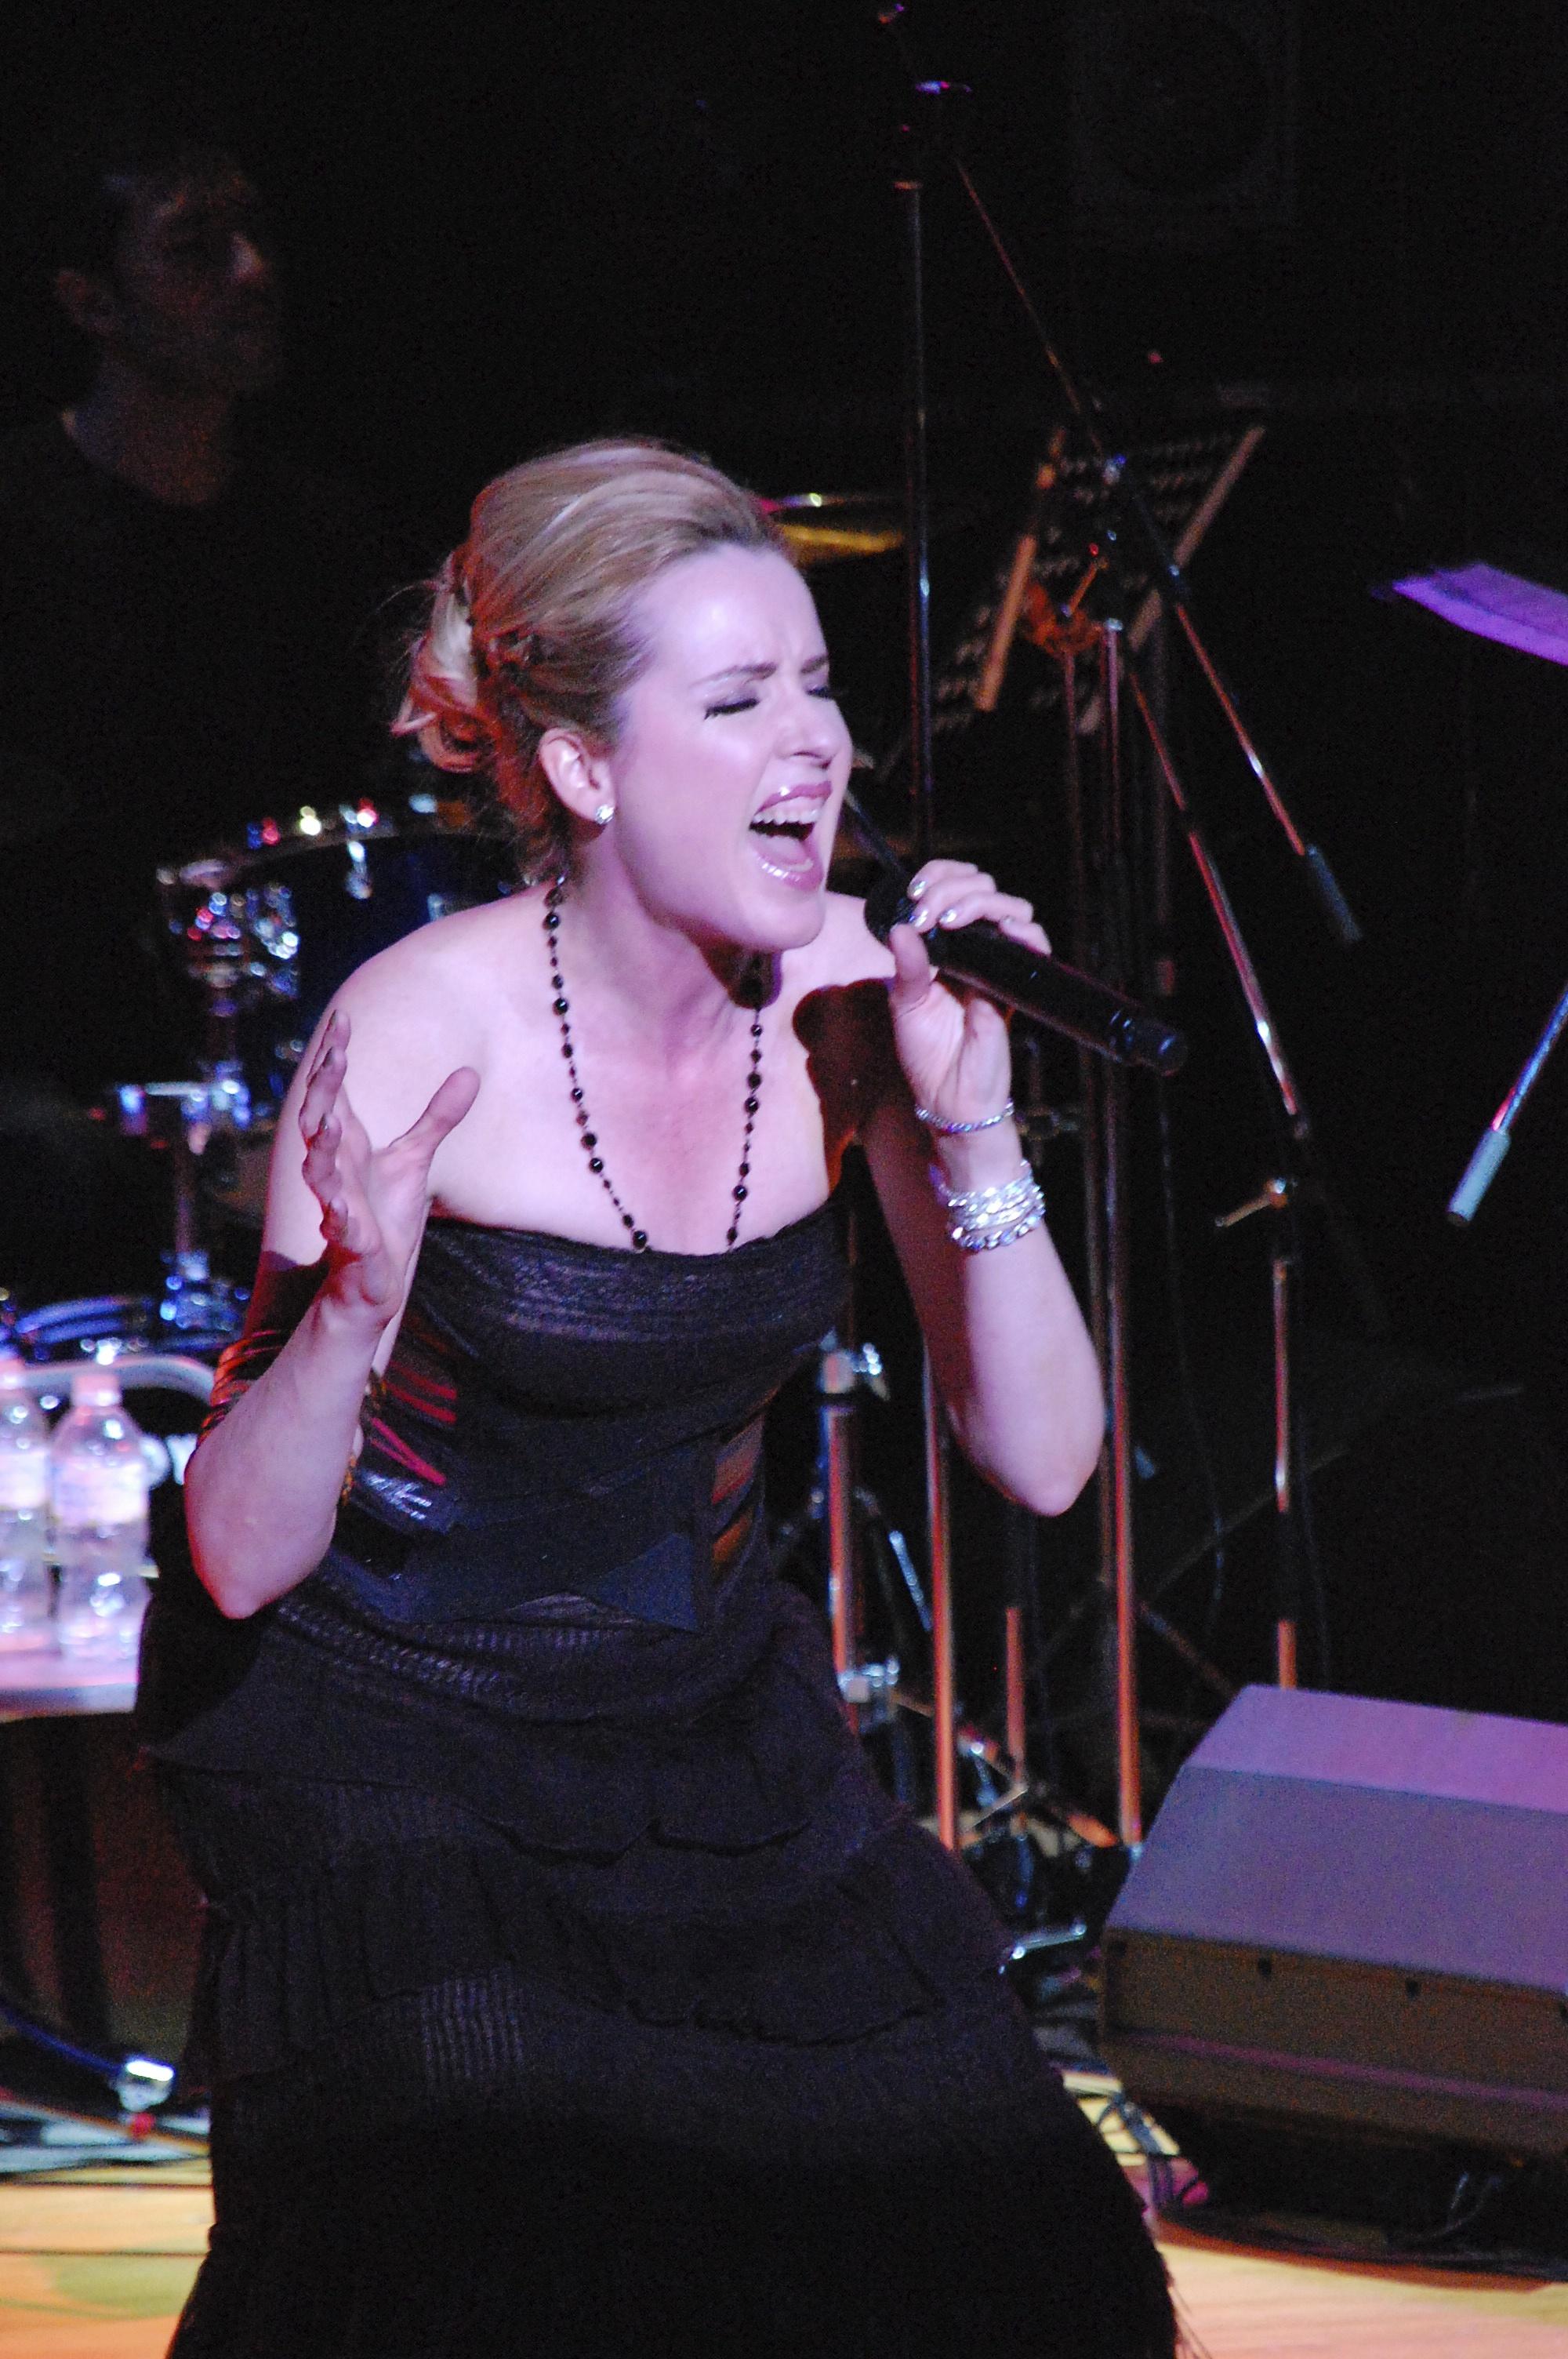 Donna concert 2013